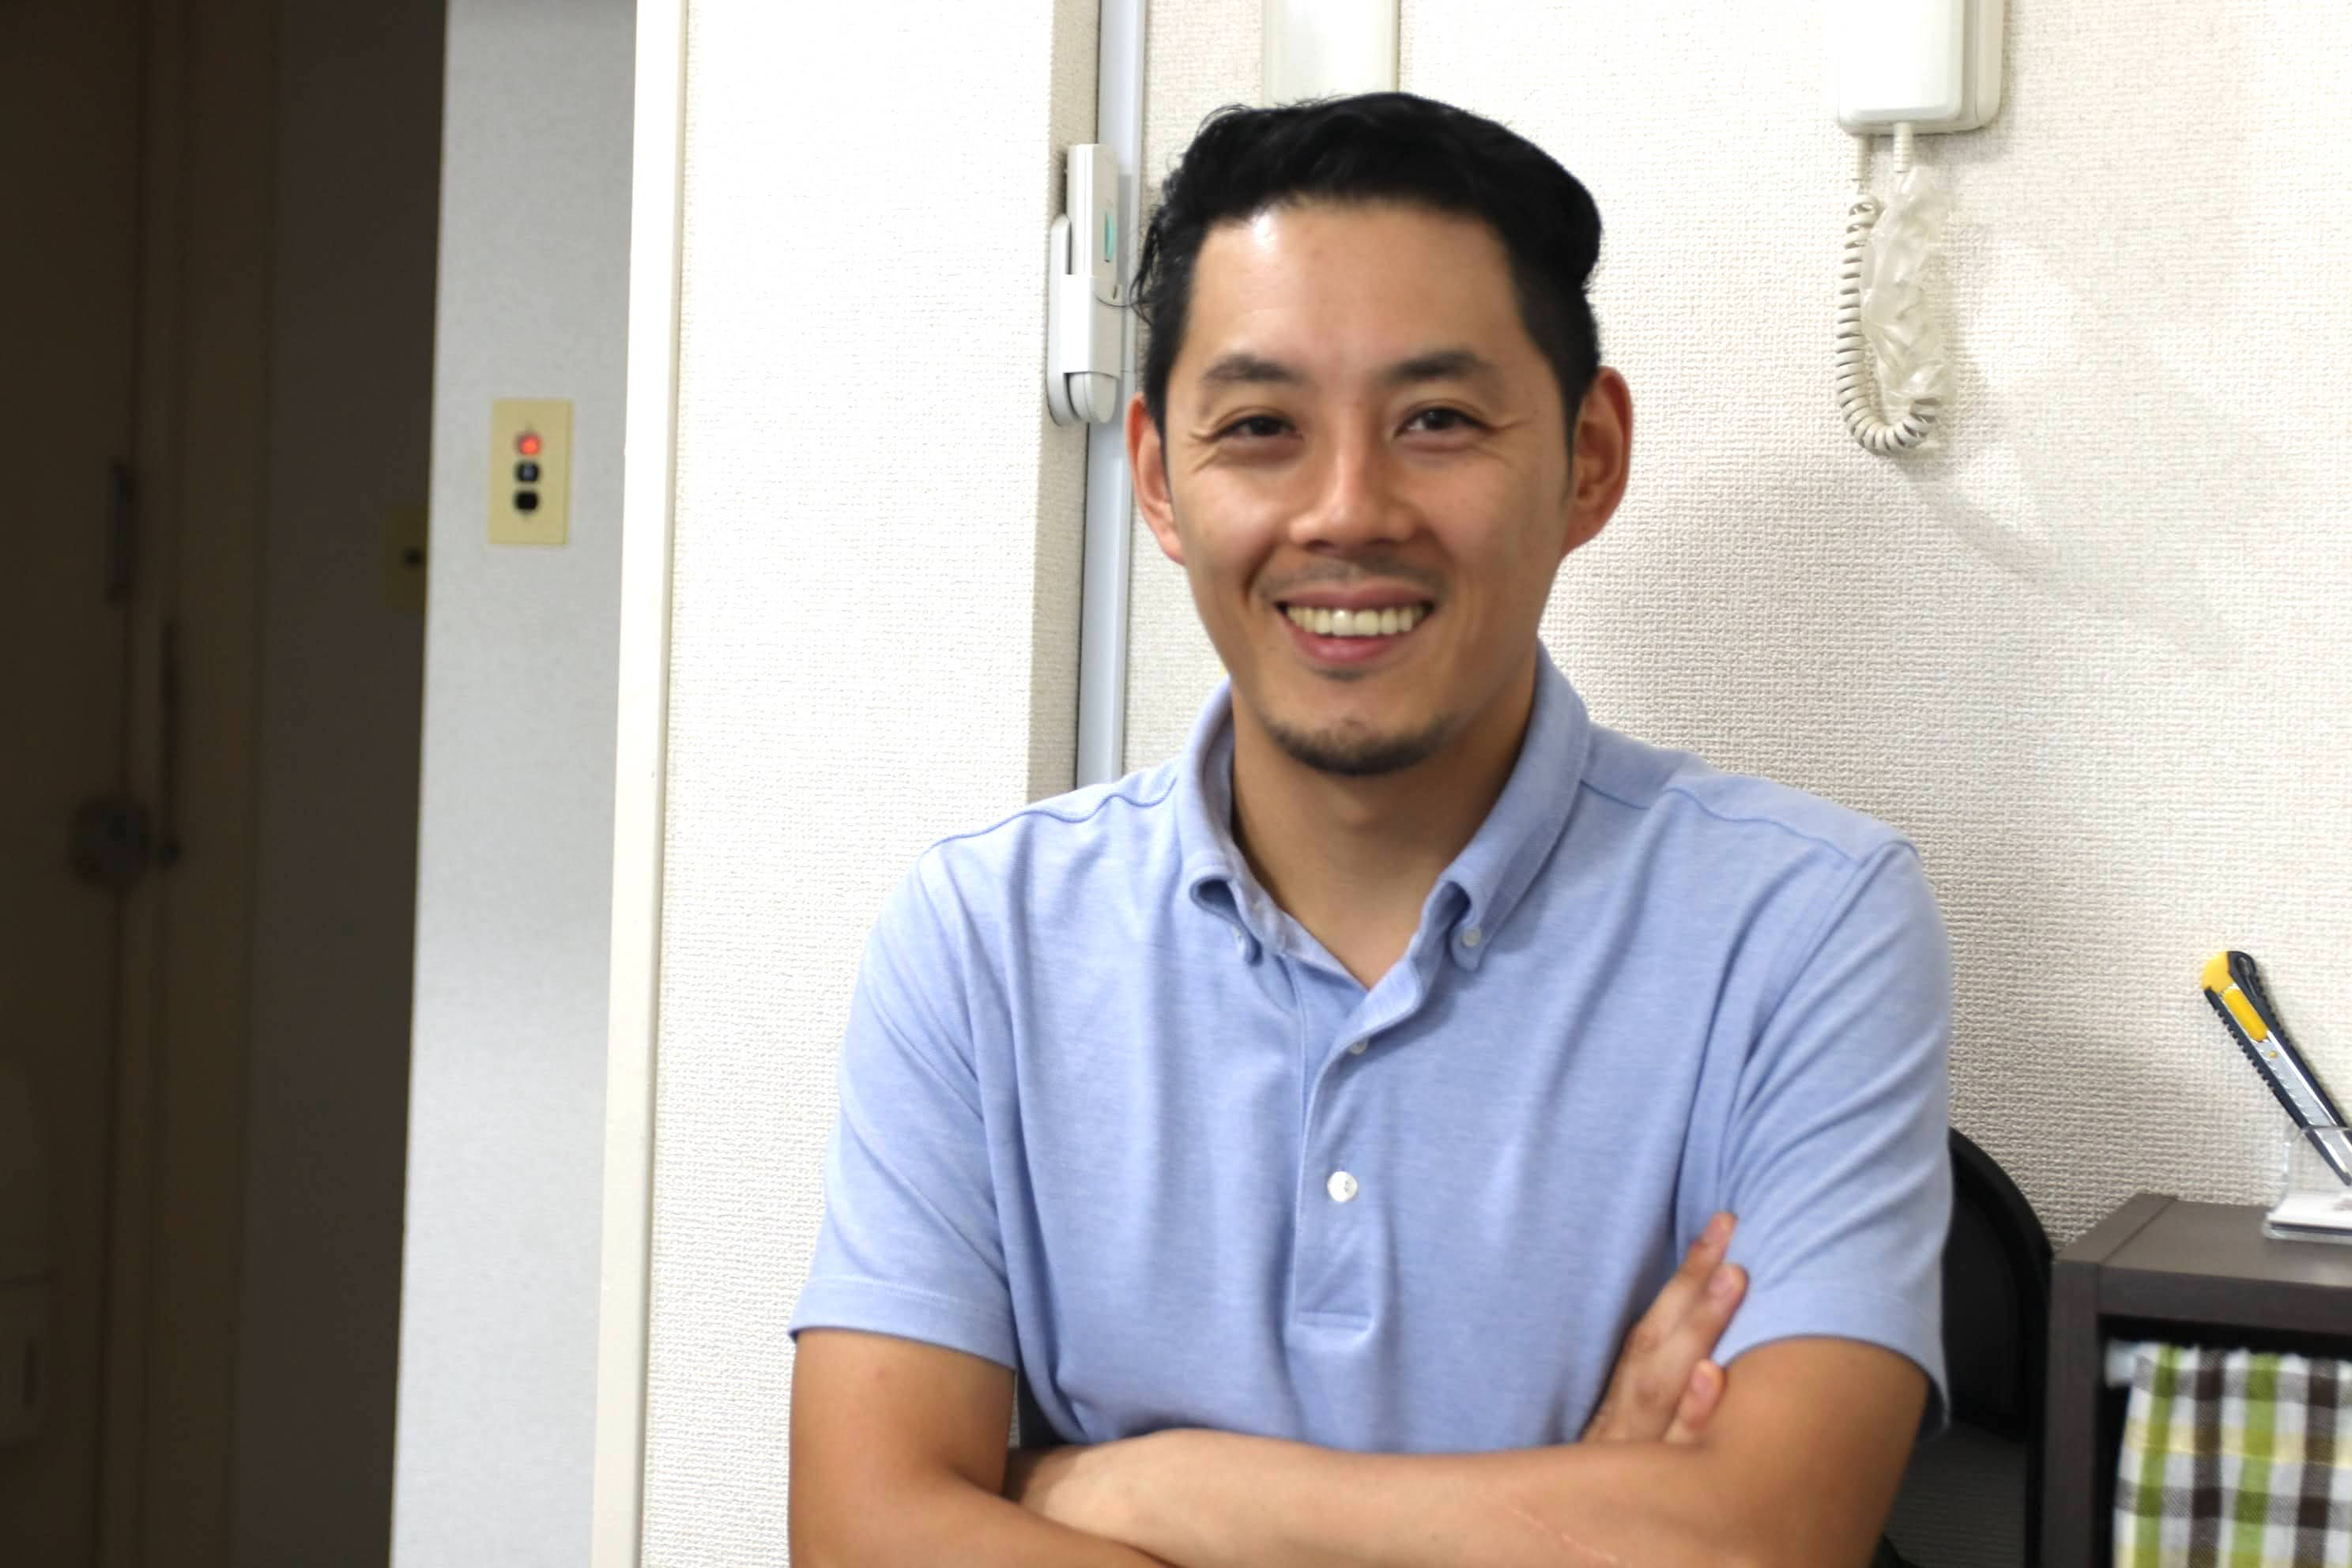 Stock(ストック)インタビュー安藤様写真